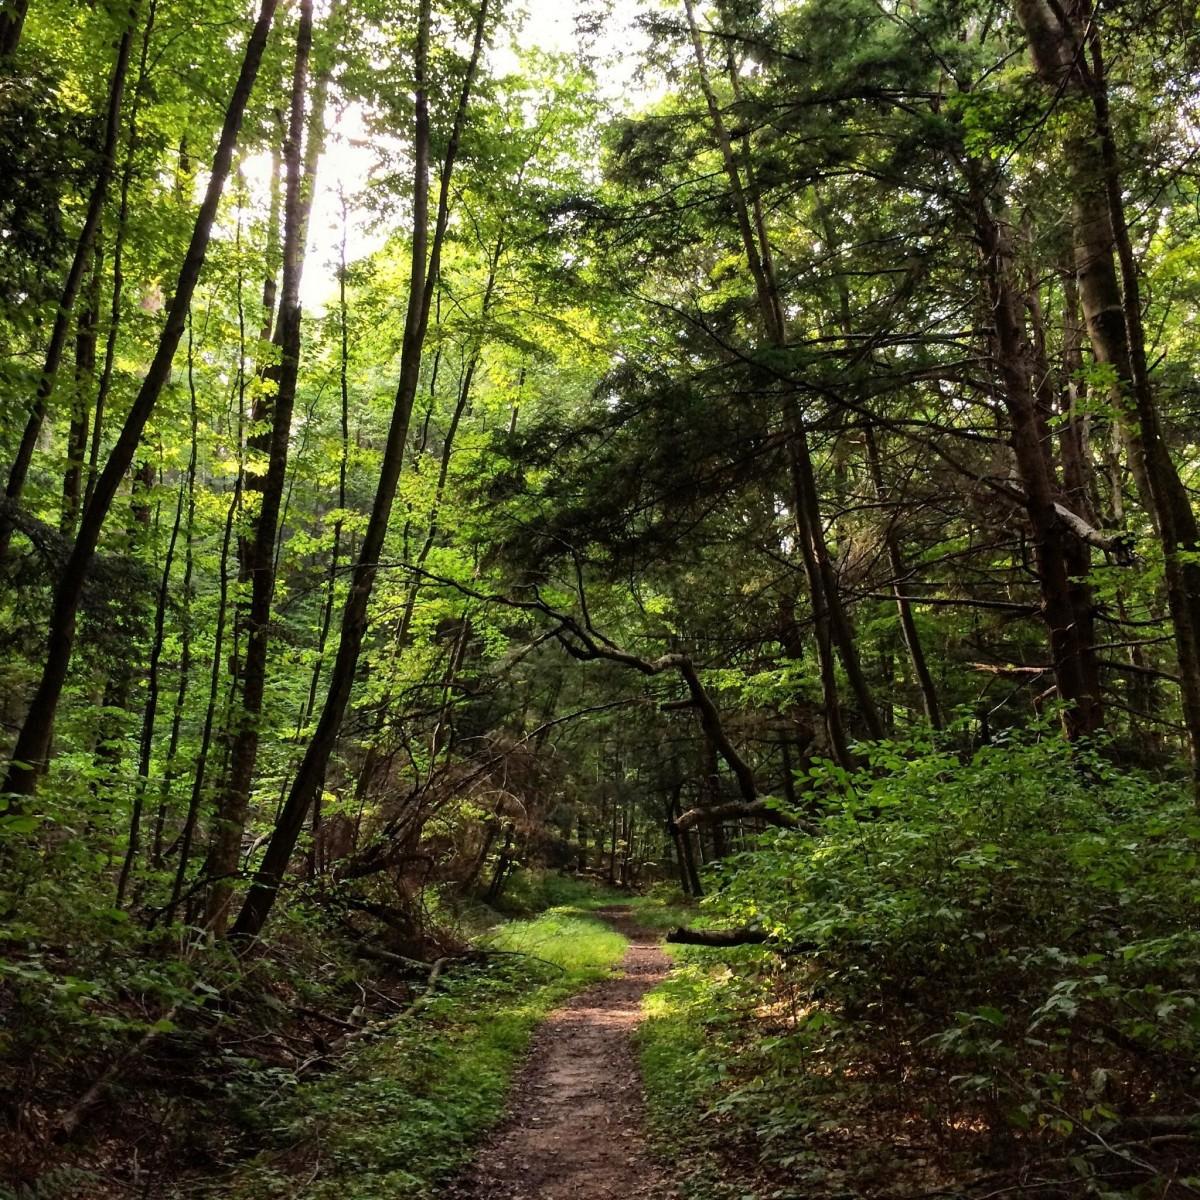 Tracy Ridge Trails. Photo by Brittany Dawkins, via alltrails.com.